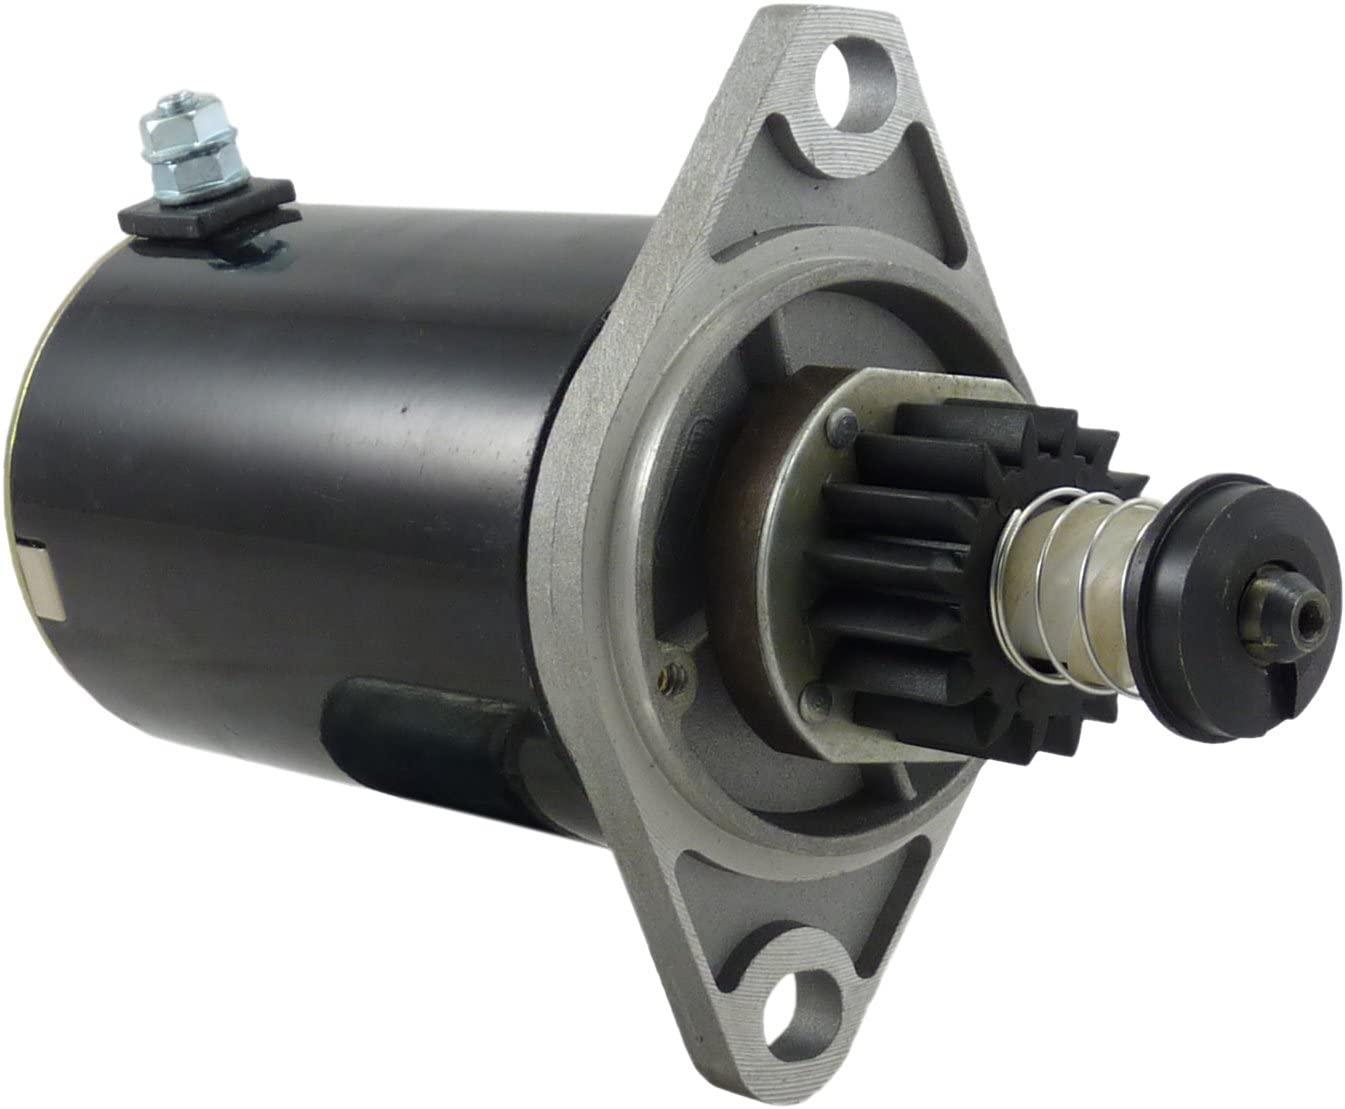 New Starter RV Generator Onan Emerald 191-2416 191-2416 191-1630 191-2132